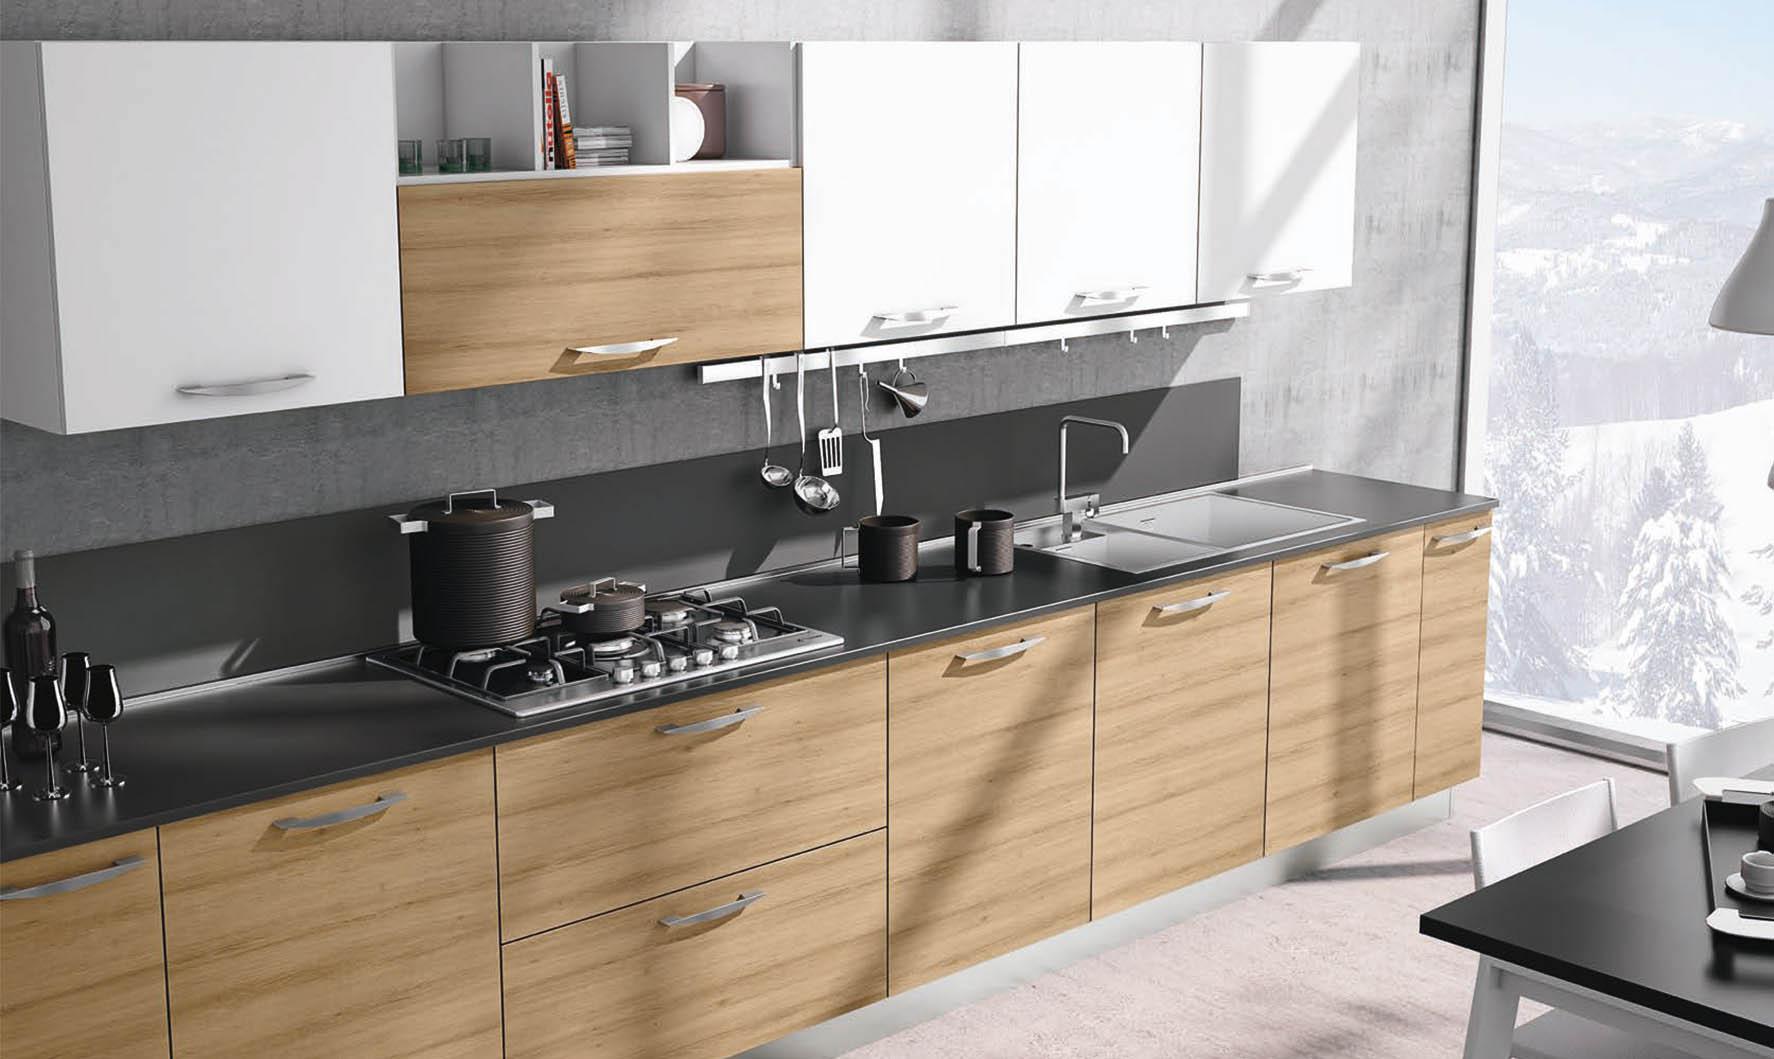 Mobili Cucina Senza Ante anta scorrevole, basculante, a vasistas: quale sistema di